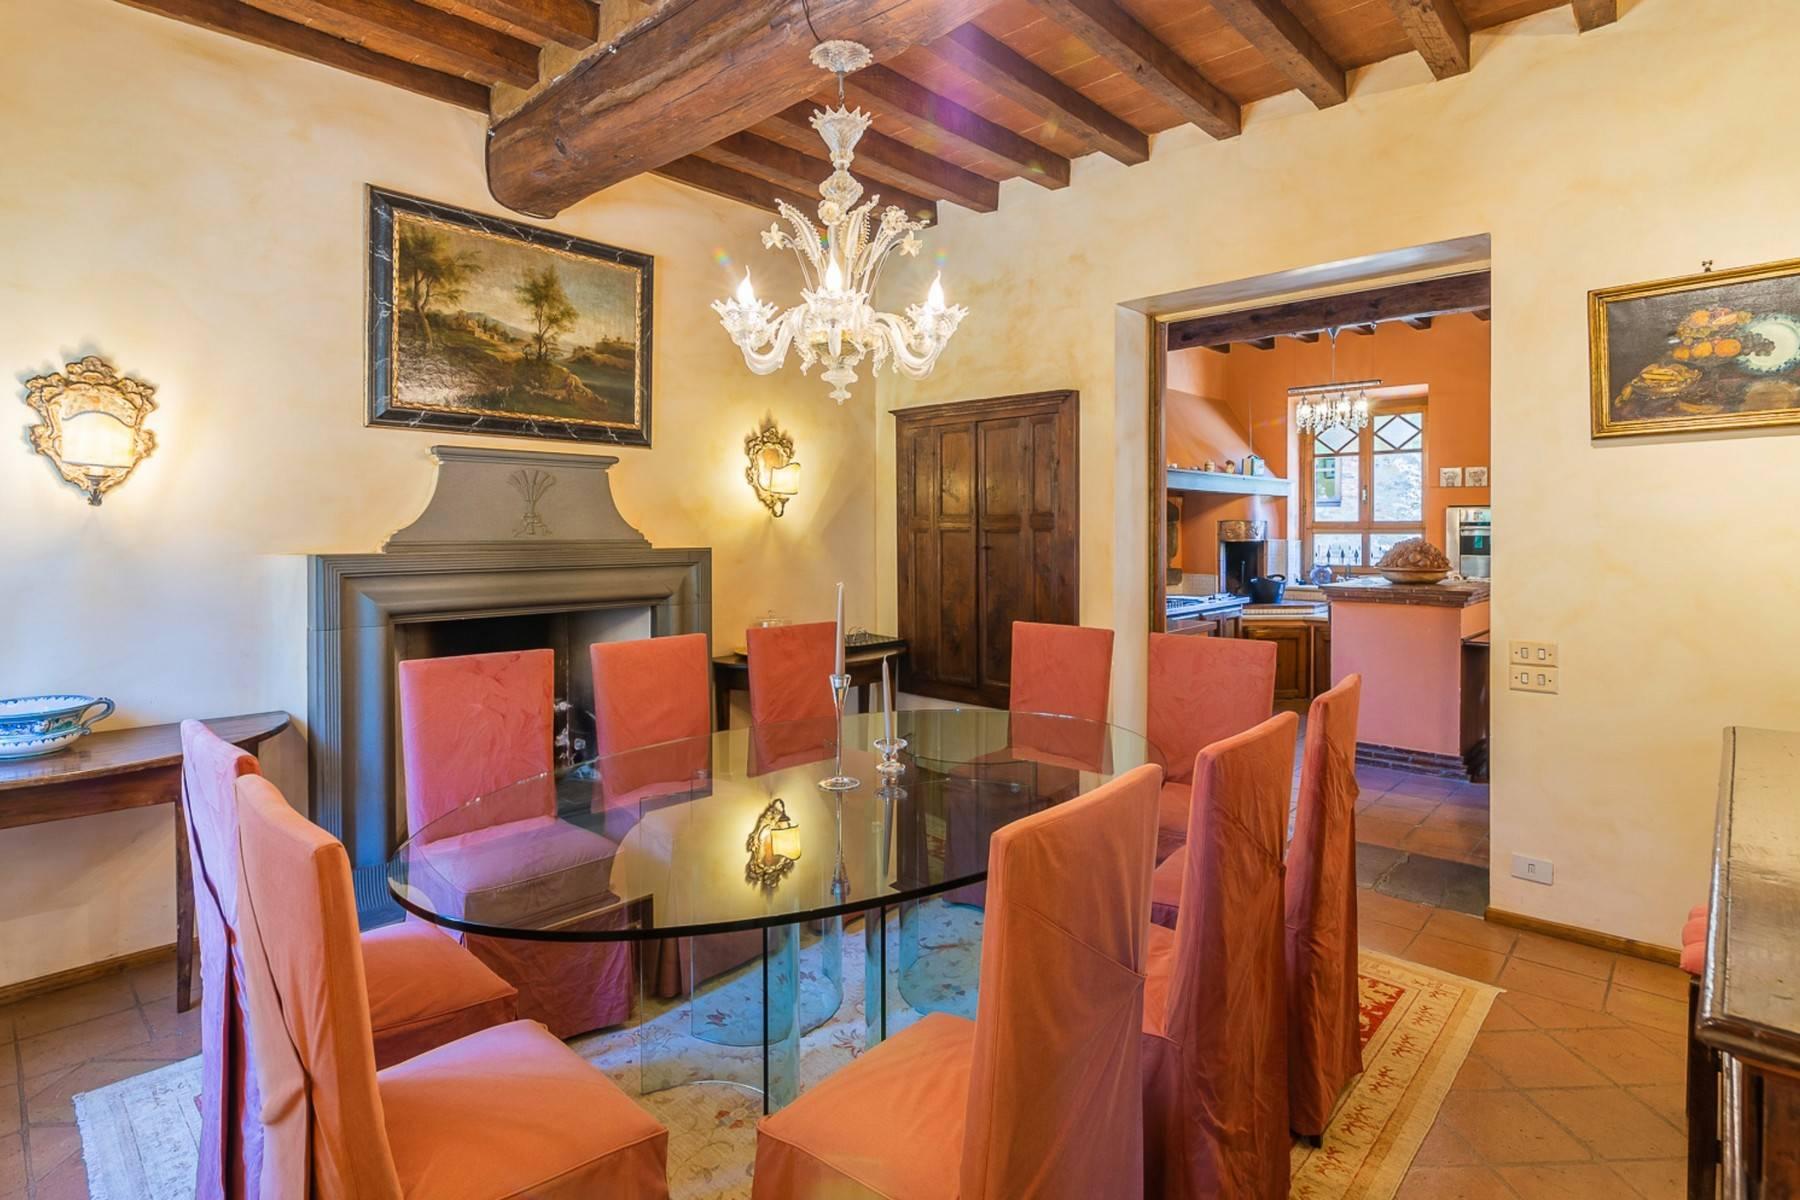 Villa in Vendita a Lucca: 5 locali, 1130 mq - Foto 8